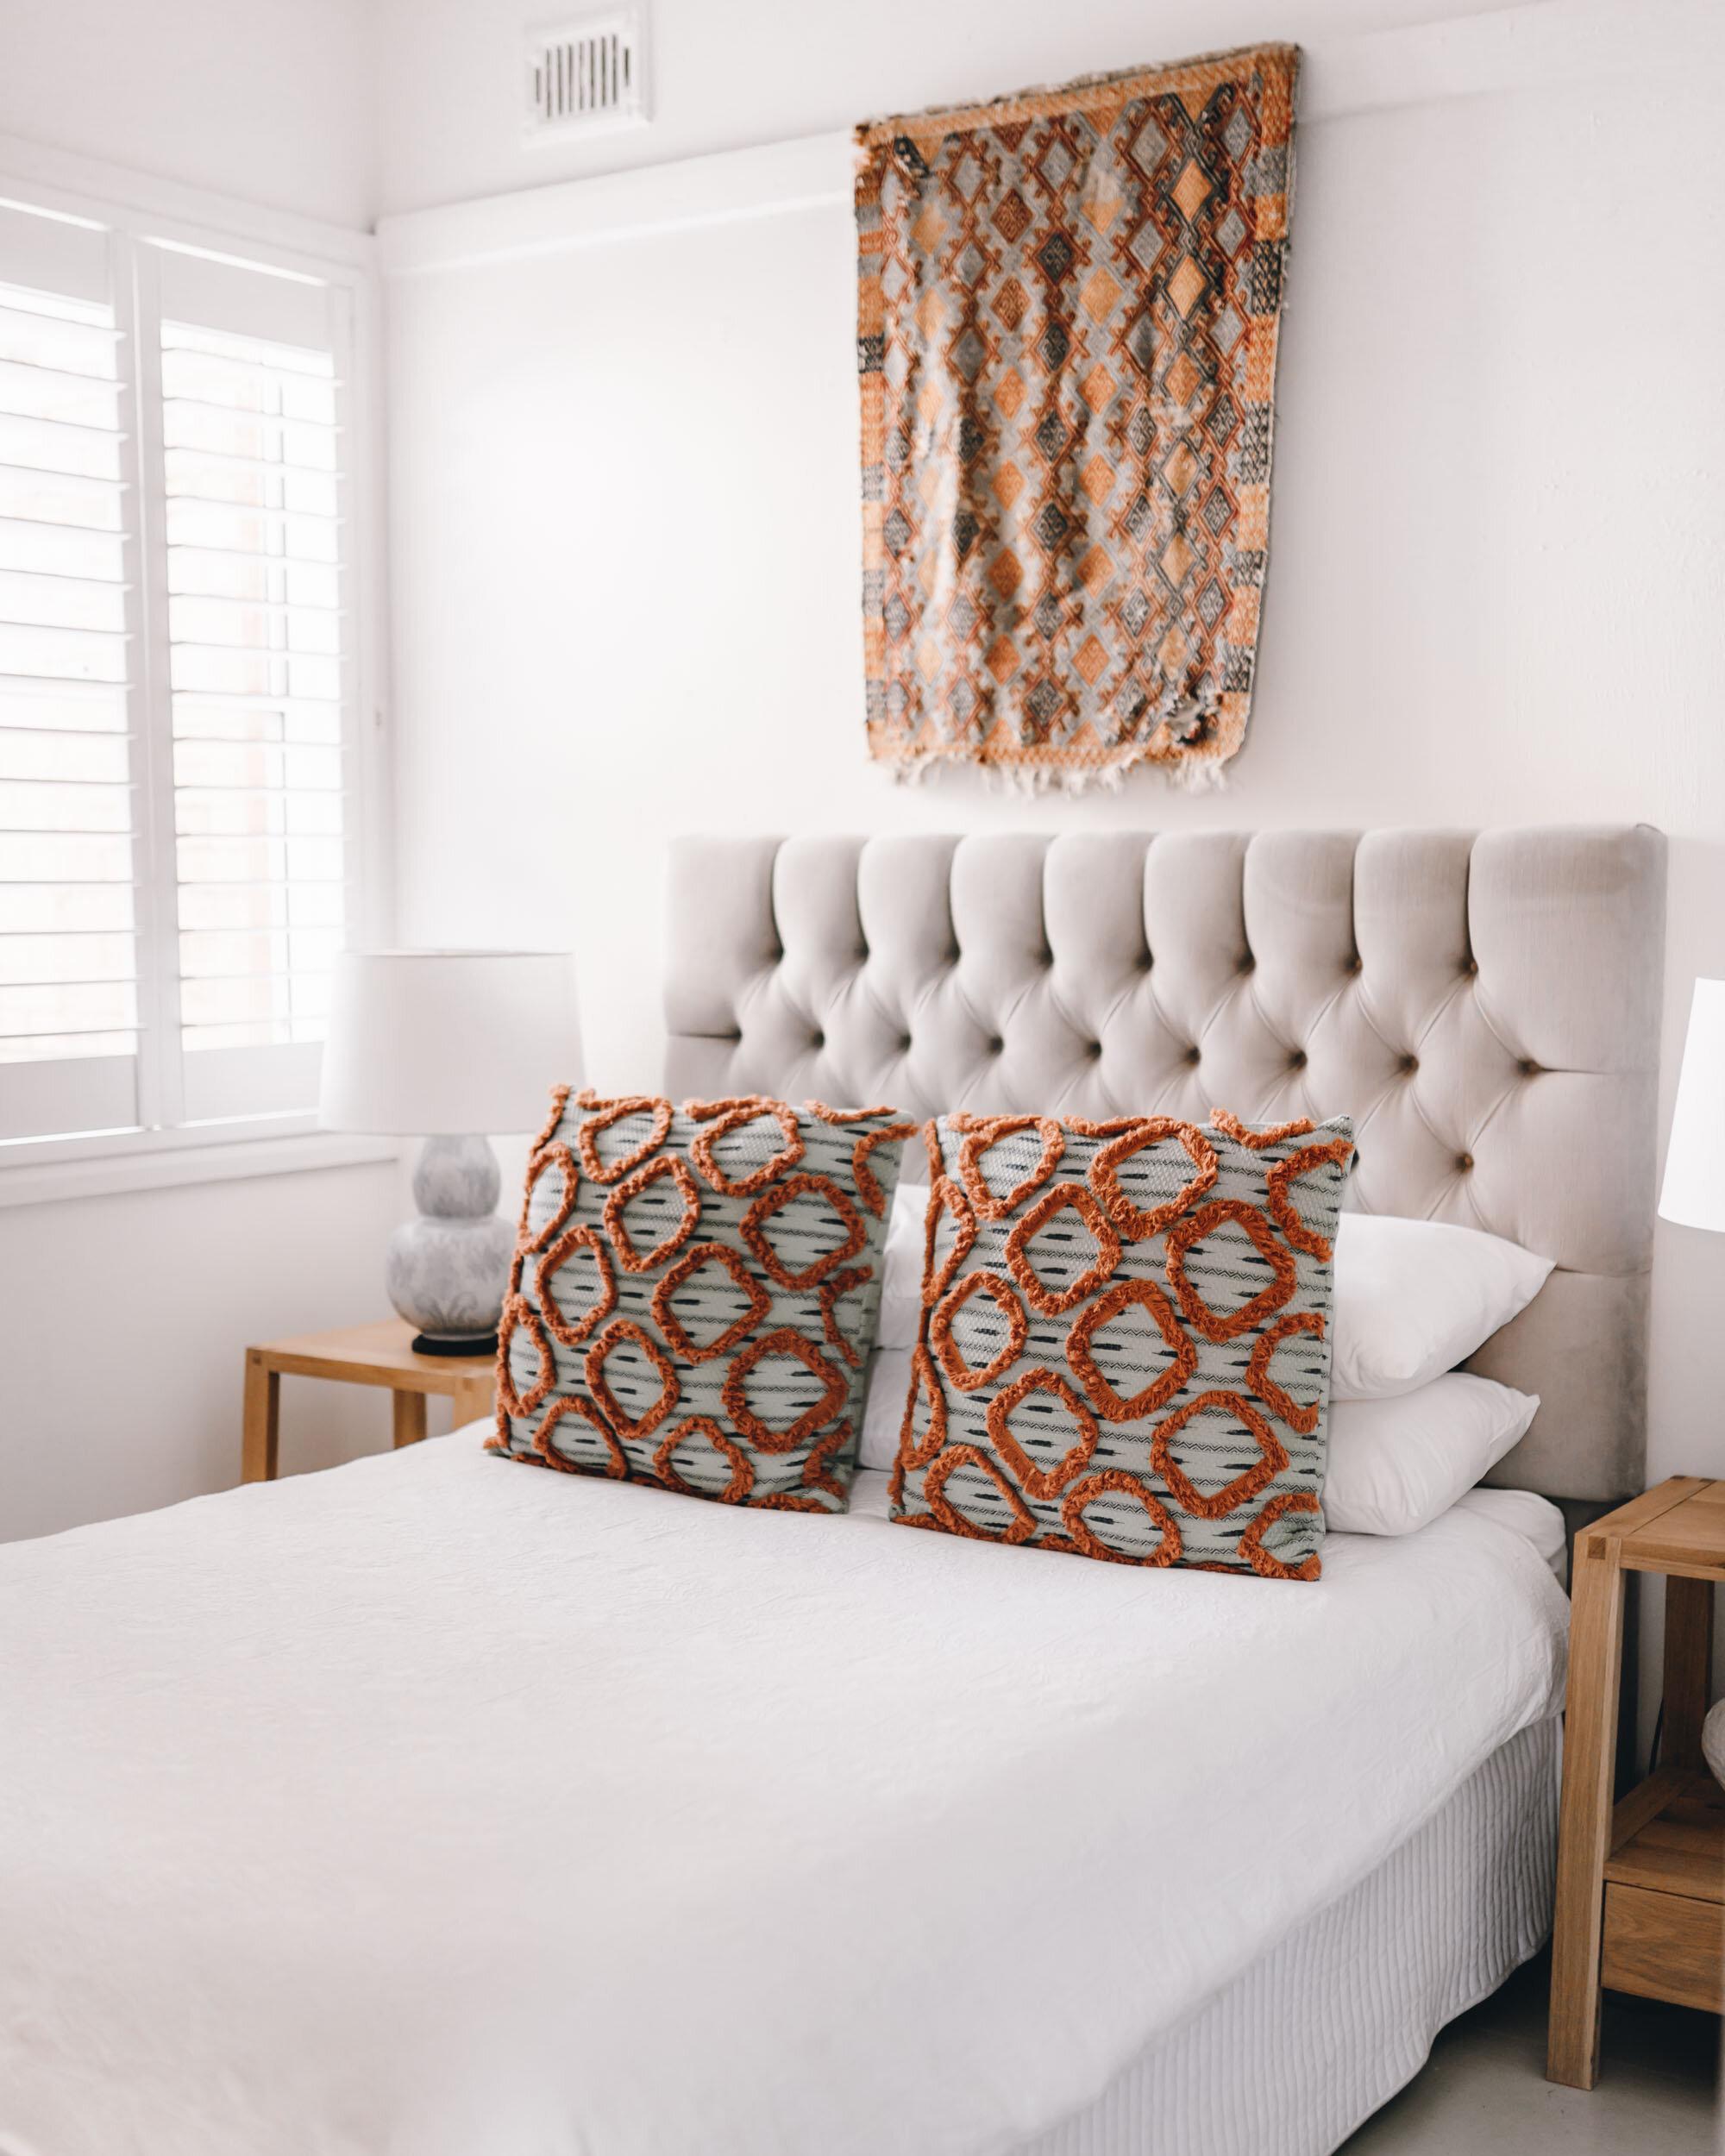 keira-mason-flourish-on-bull-street-master-bedroom.jpg